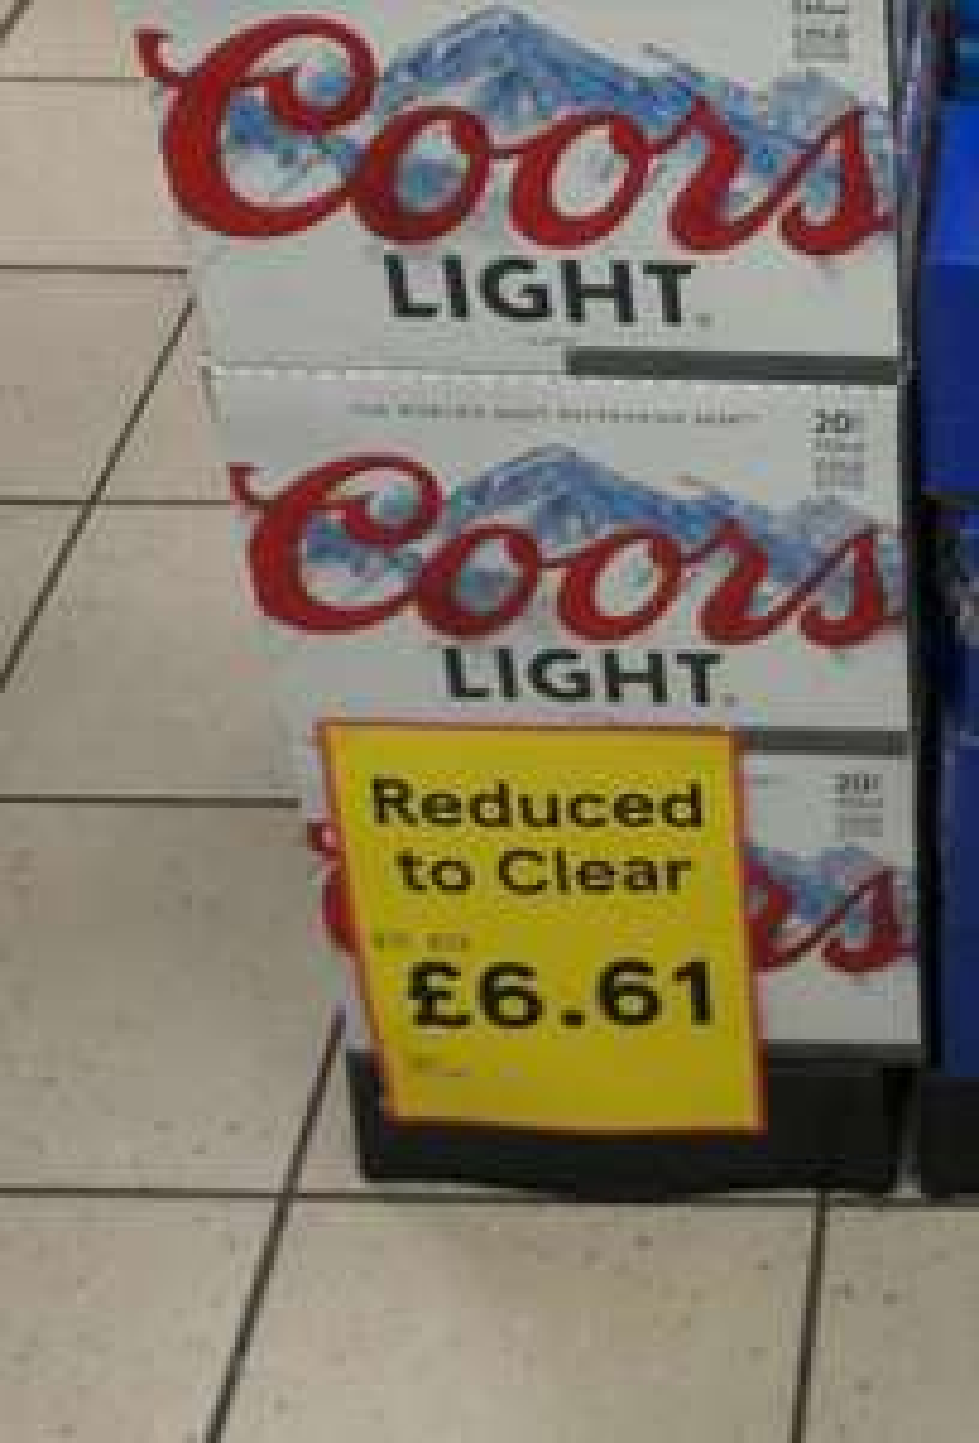 Coors Light 20 X 330Ml £6.61 instore @ Tesco George Street CR0